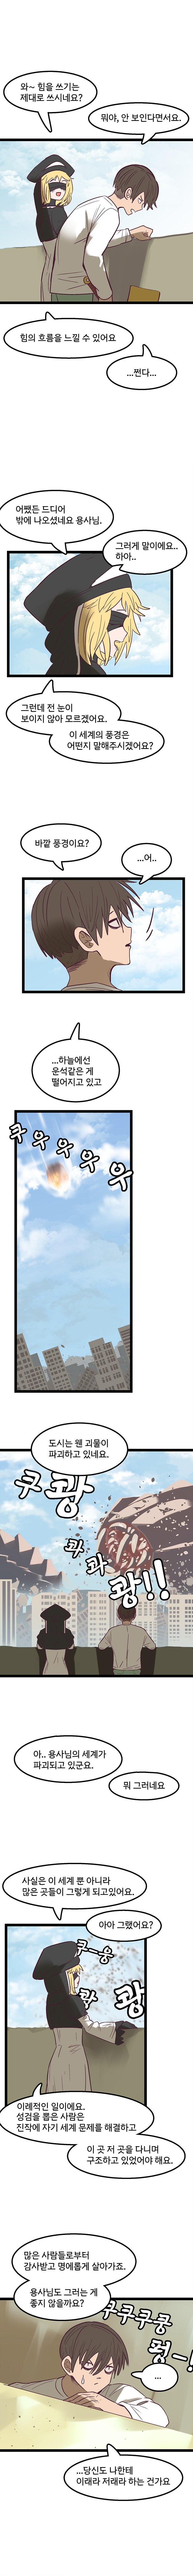 viewimage.php?id=2ebcc232eadd36&no=24b0d769e1d32ca73fec84fa11d0283195228ddcef8f2e560a89ffd9a63fe1213215c25d6781060fe62b21e7a02d6224bb14699e5e6efdb79520601e68abe096bdd8f4